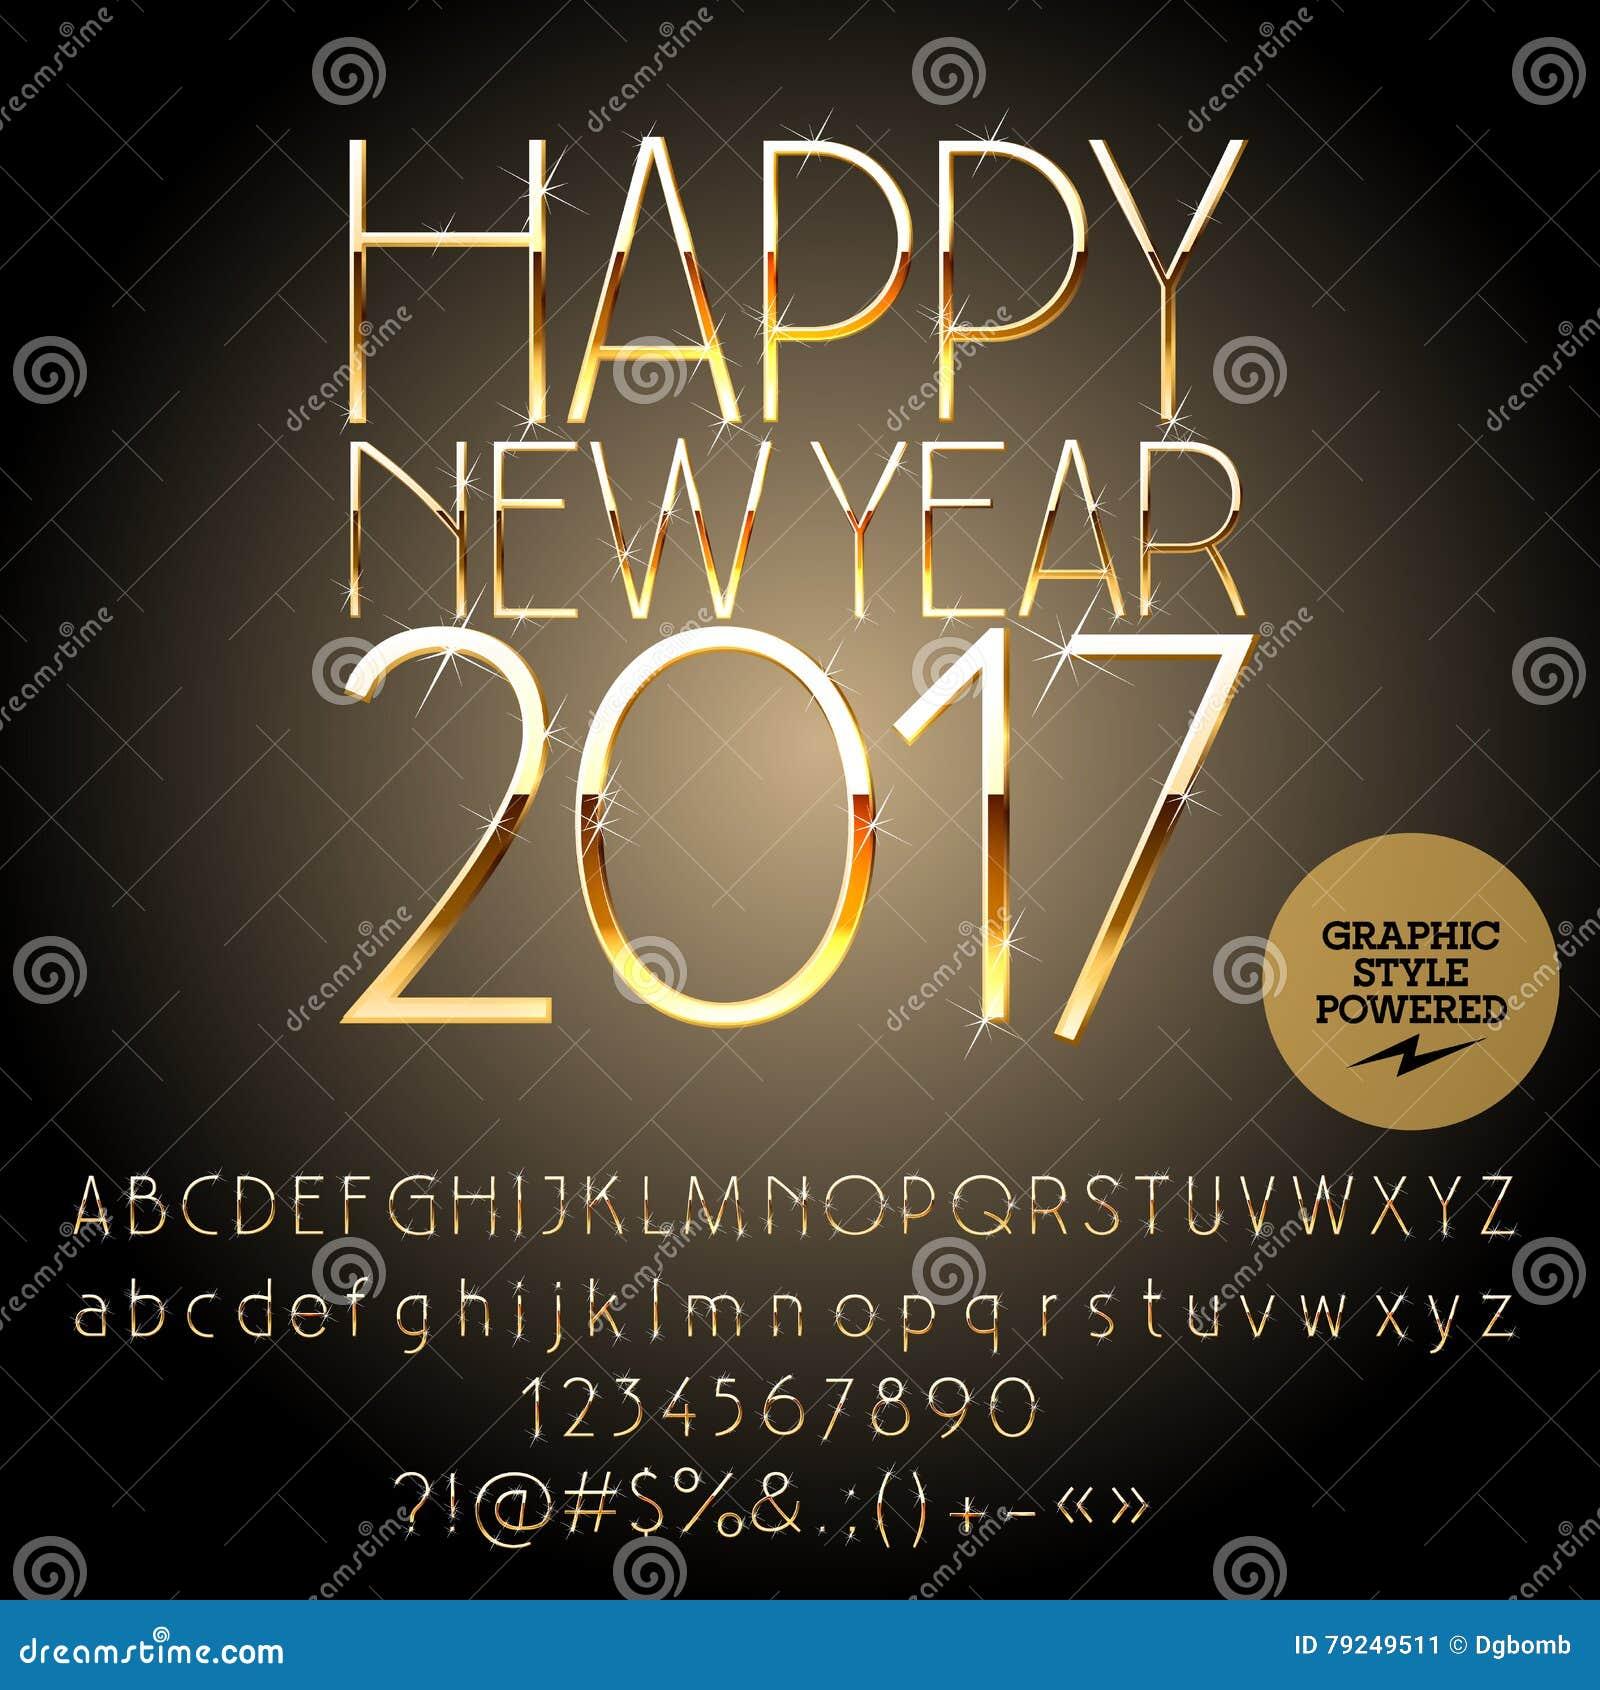 Vector stylish happy new year 2017 greeting card stock vector vector stylish happy new year 2017 greeting card buycottarizona Gallery